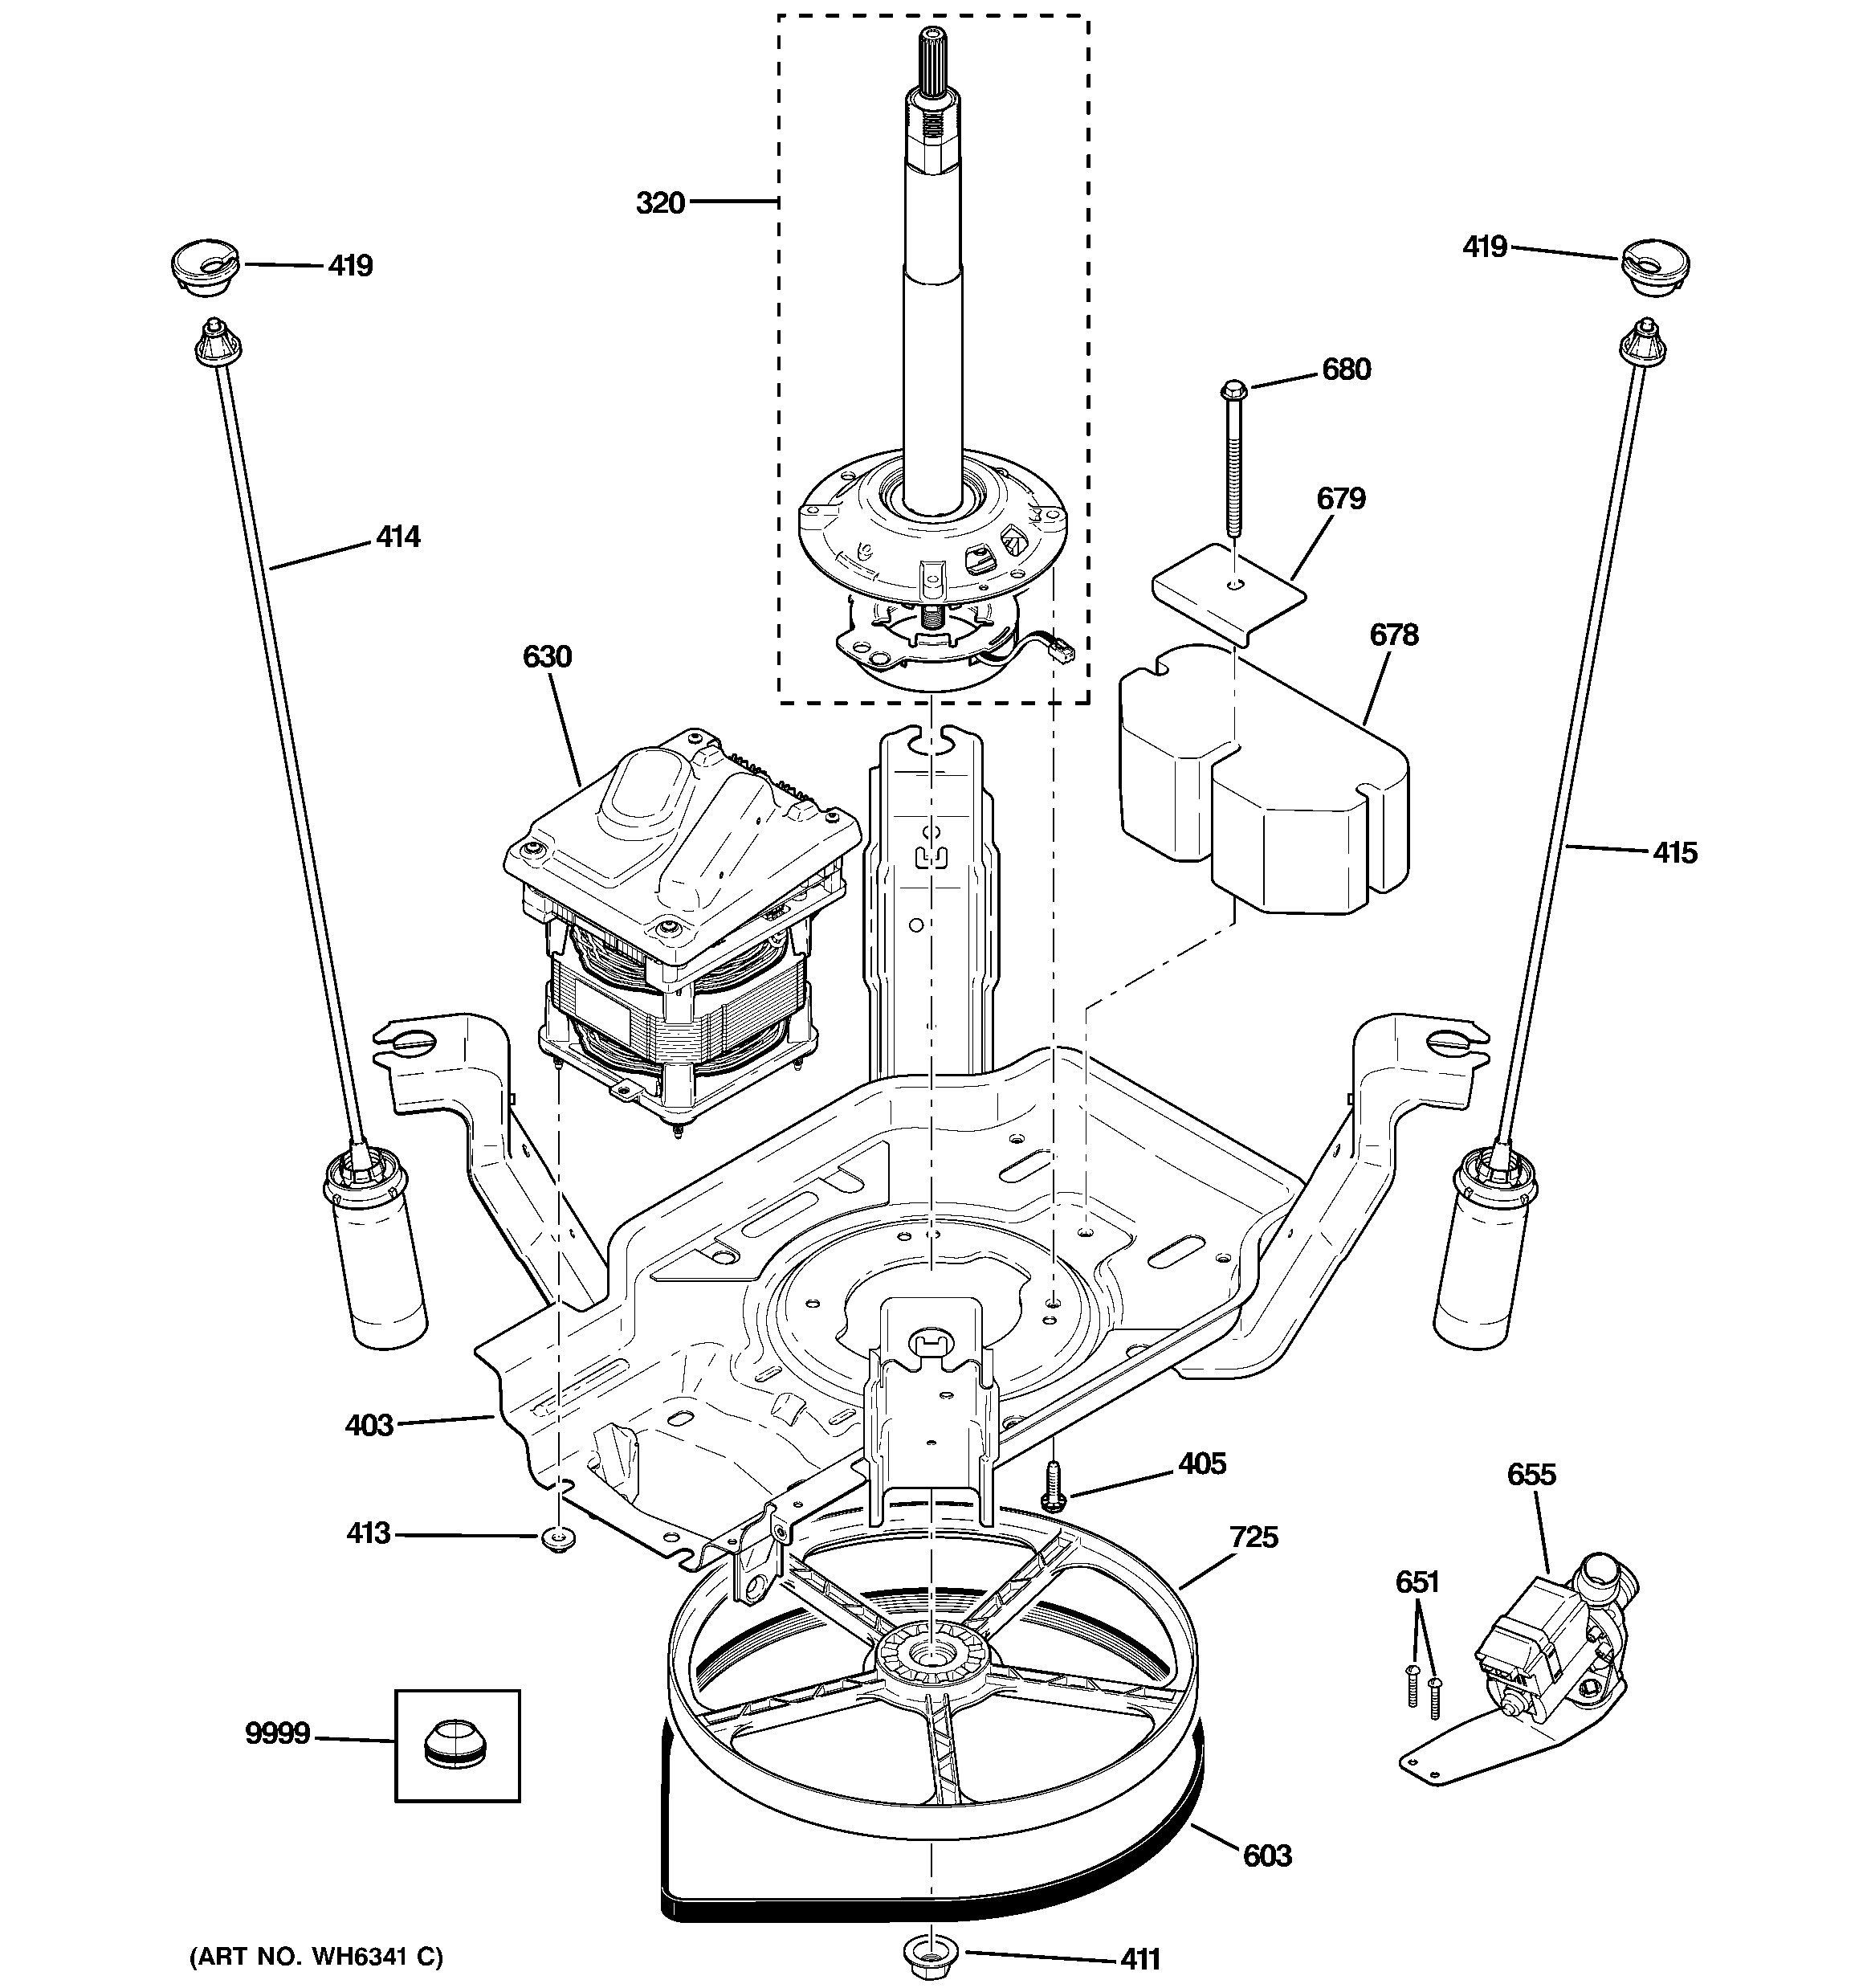 Diagram Of Engine Parts Ge Model Wjrr4170g0ww Residential Washers Genuine Parts Of Diagram Of Engine Parts